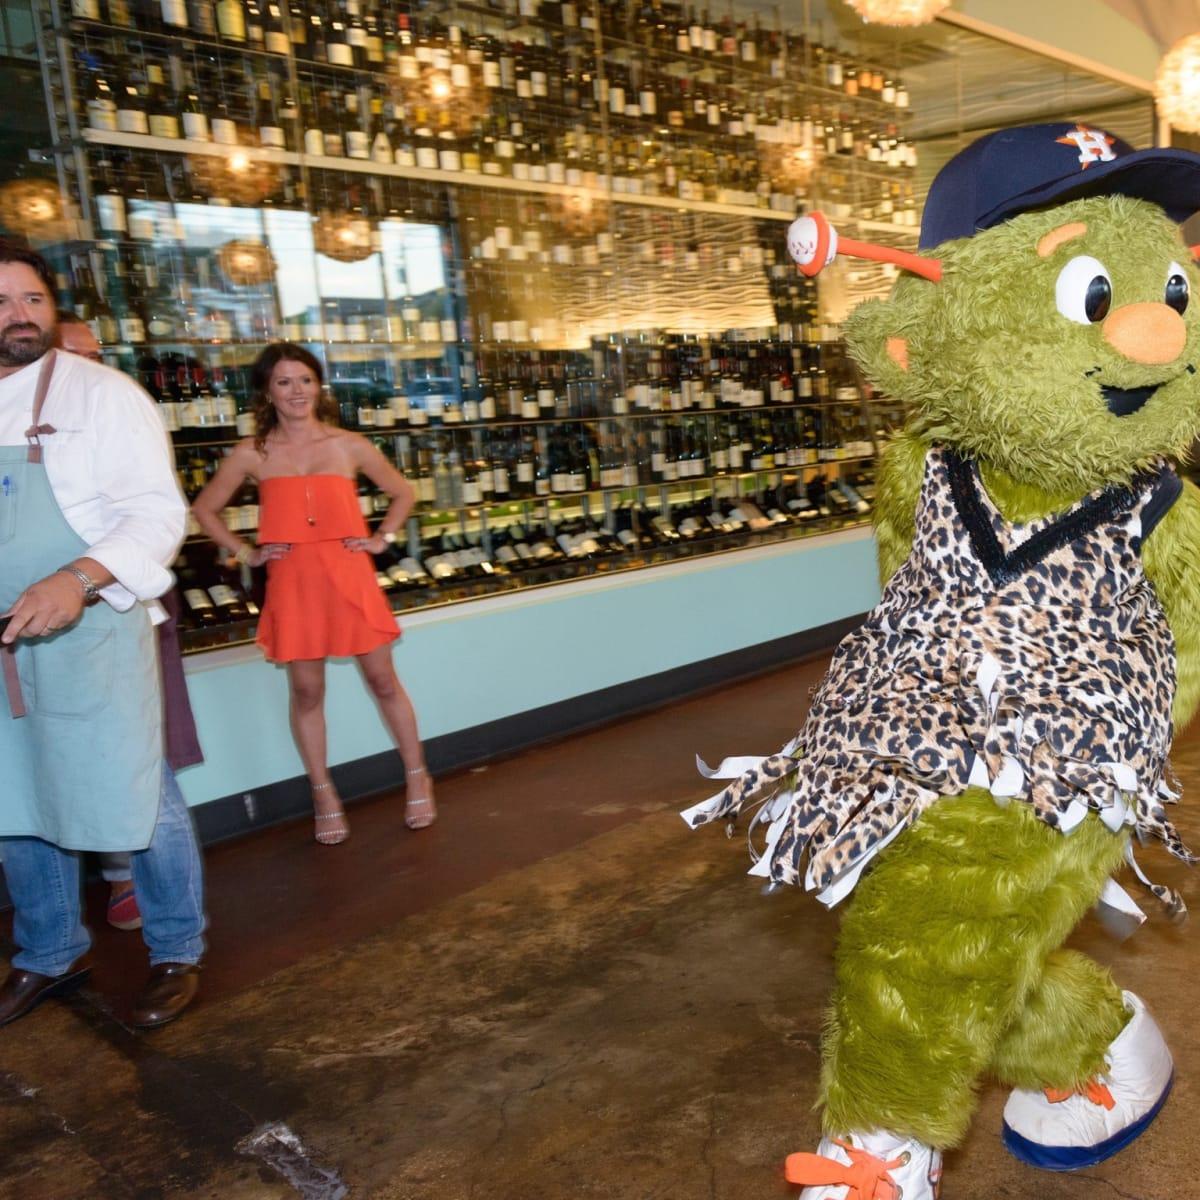 Salty Supper Orbit Houston Astros dance